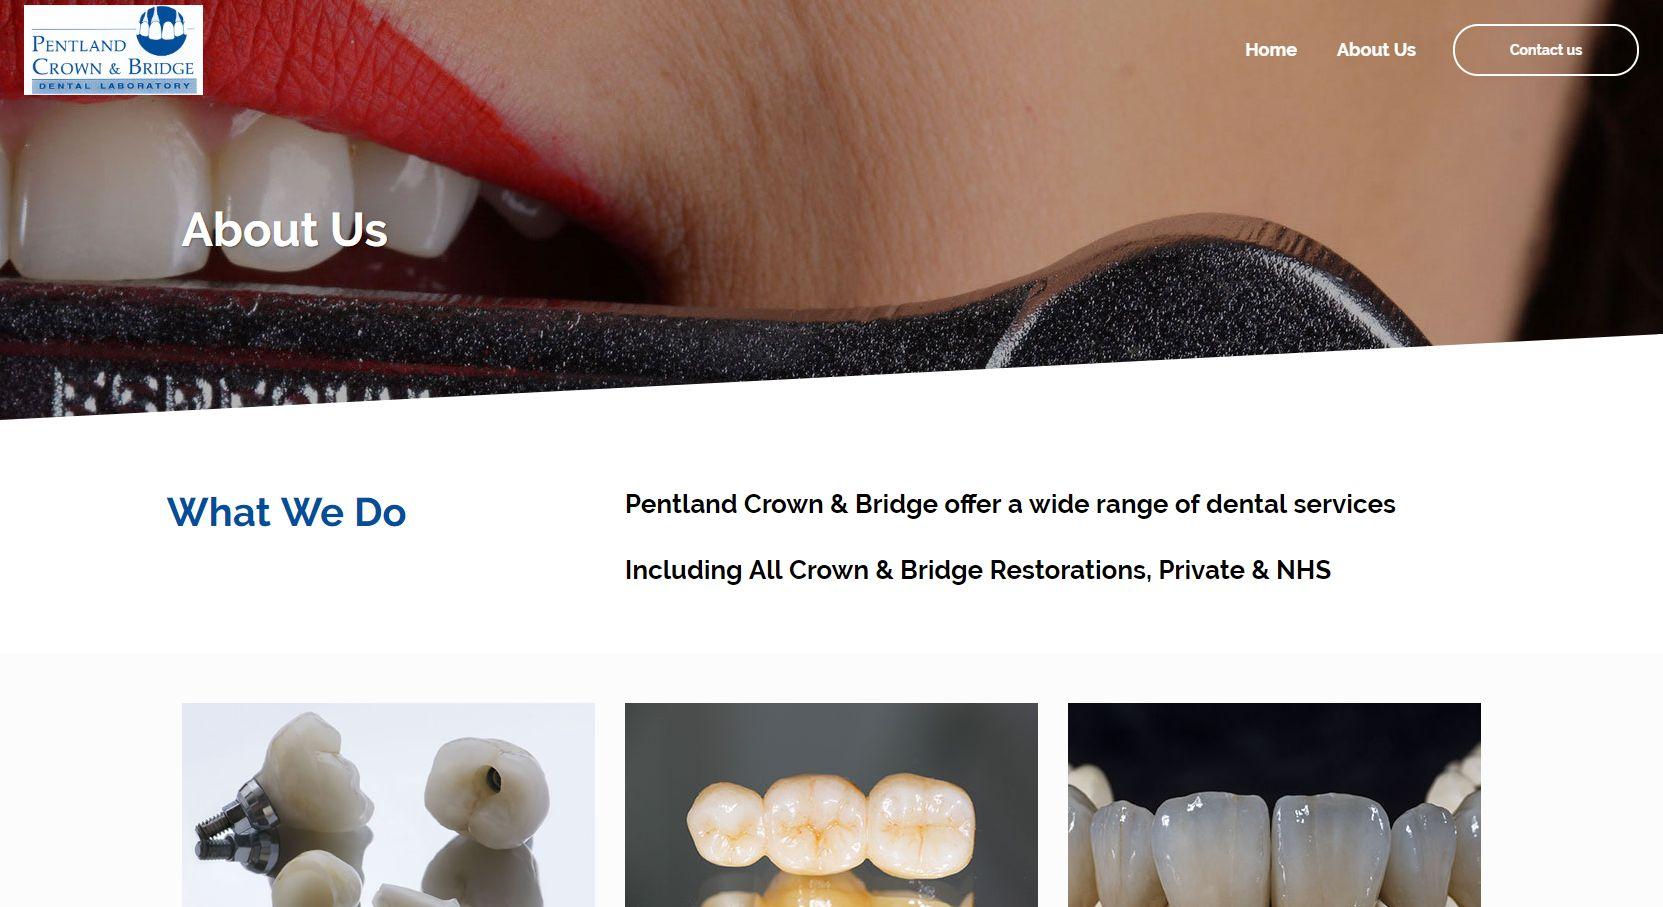 Pentland Crown & Bridge About